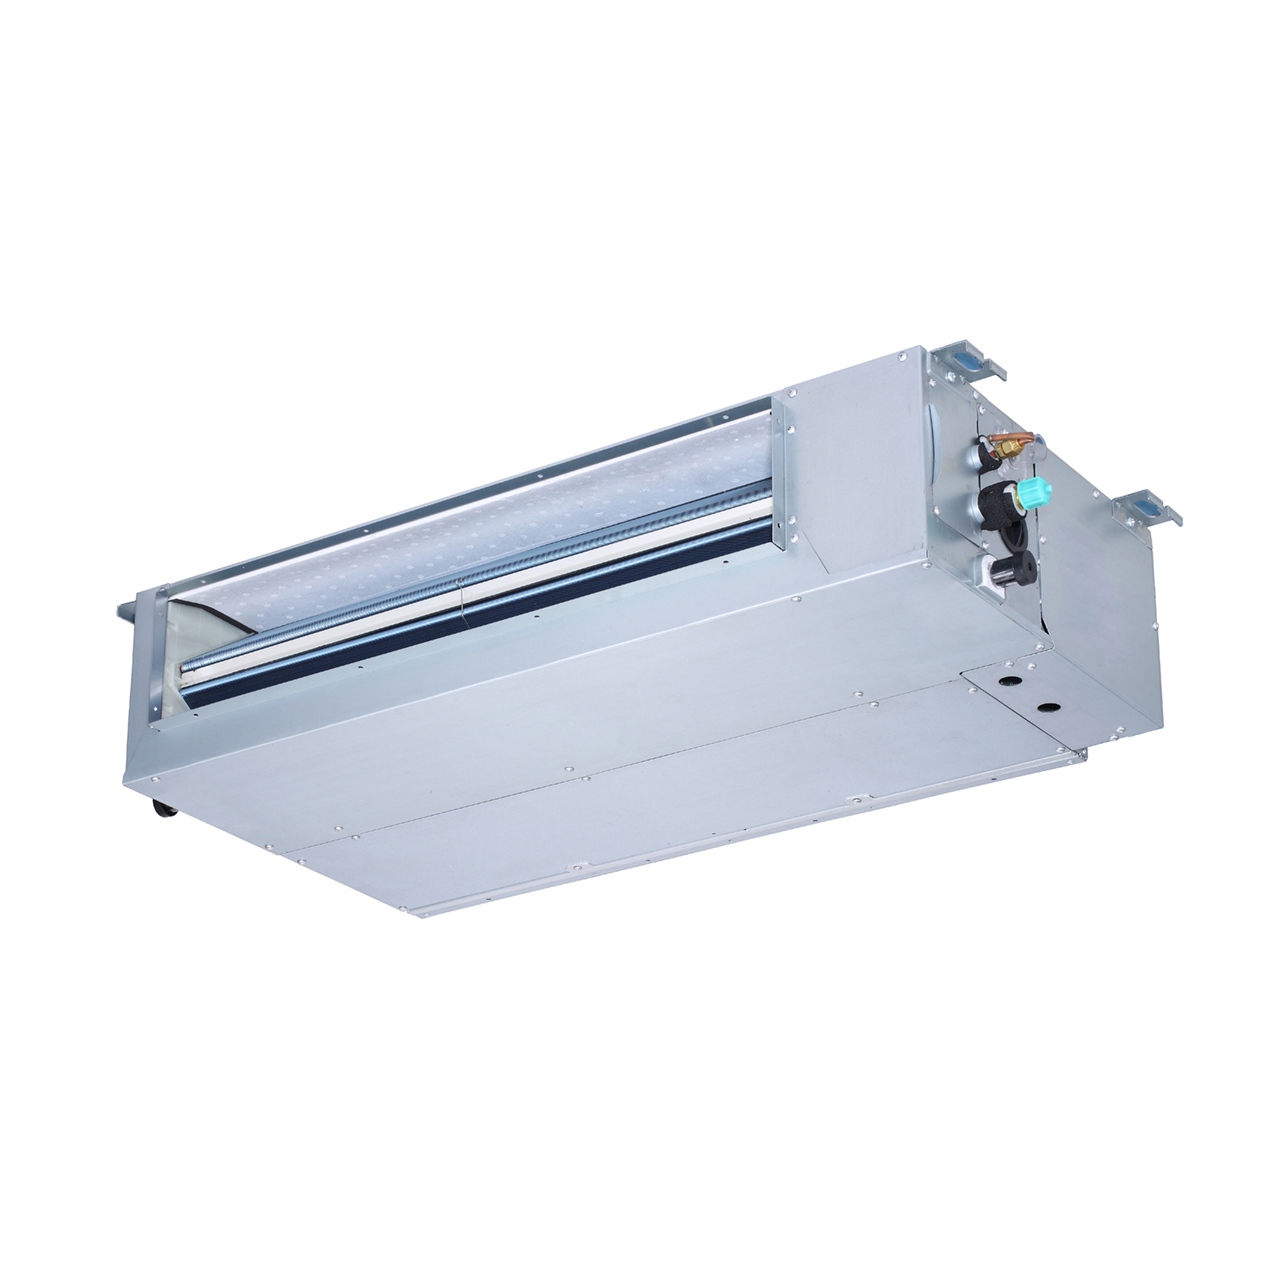 carrier-40vml-24k-low-static-duct-indoor-unit